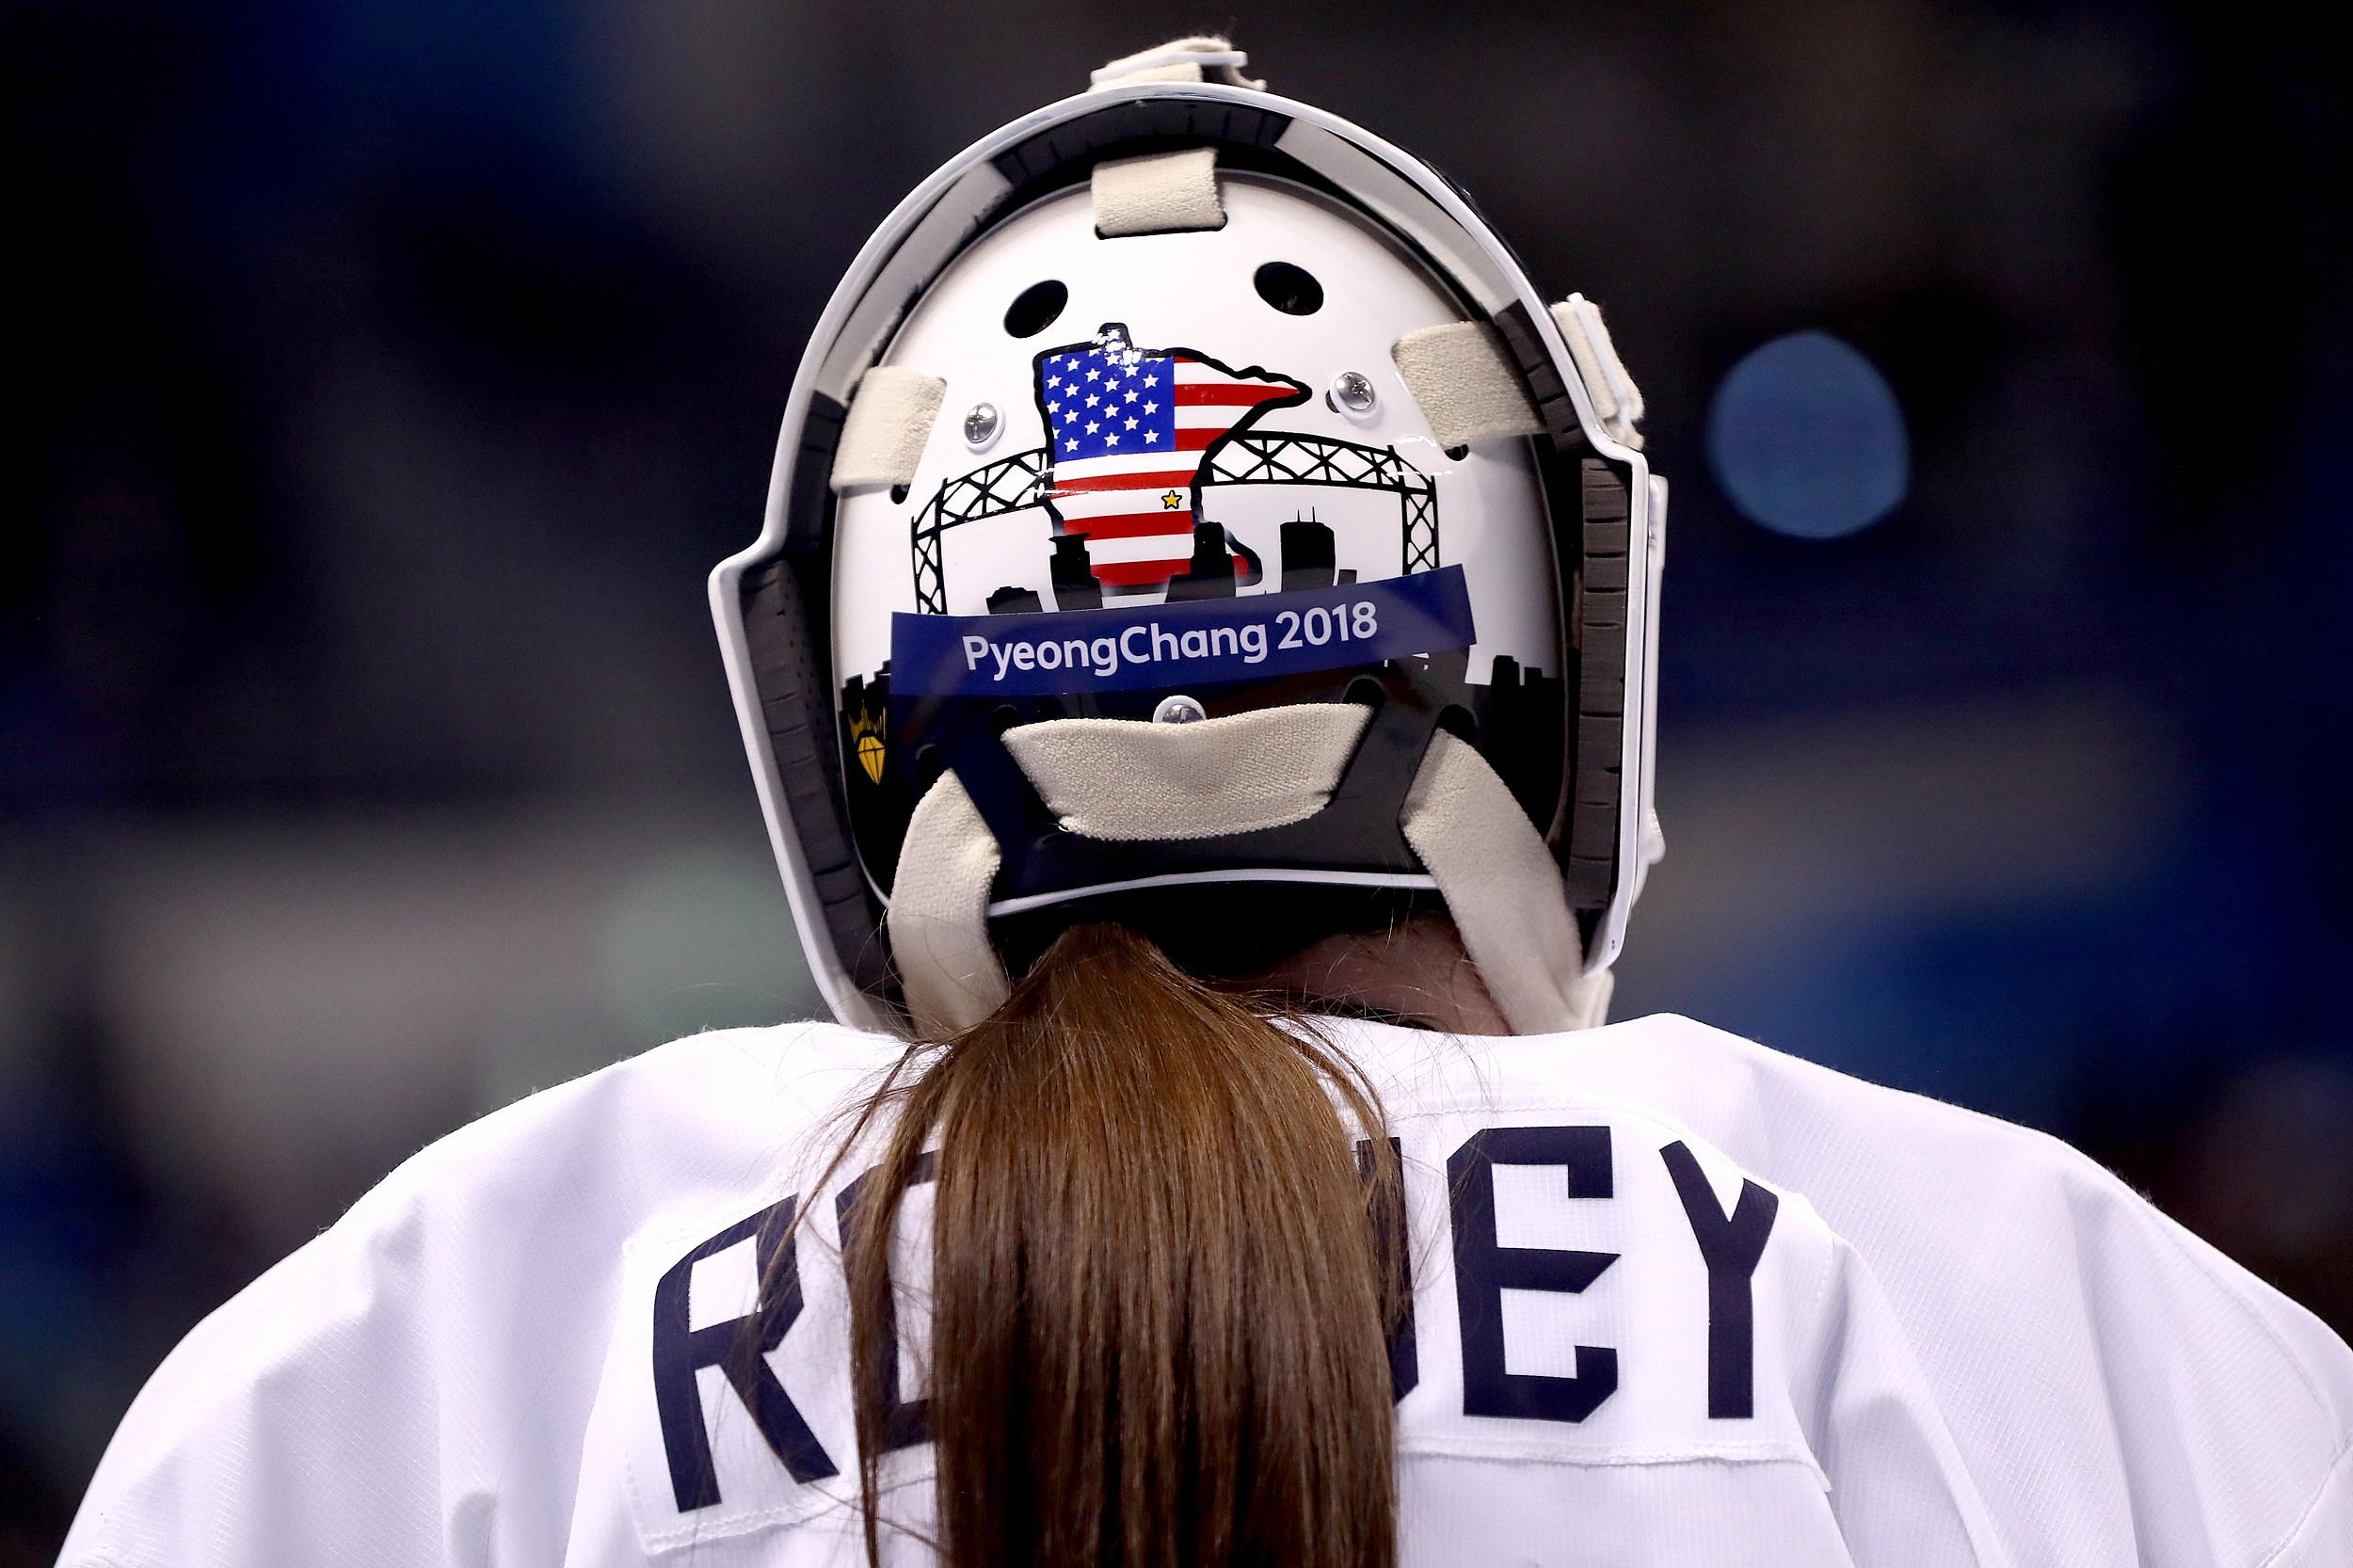 Iconic Duluth Landmark Featured On Goalie's Helmet For Olympics